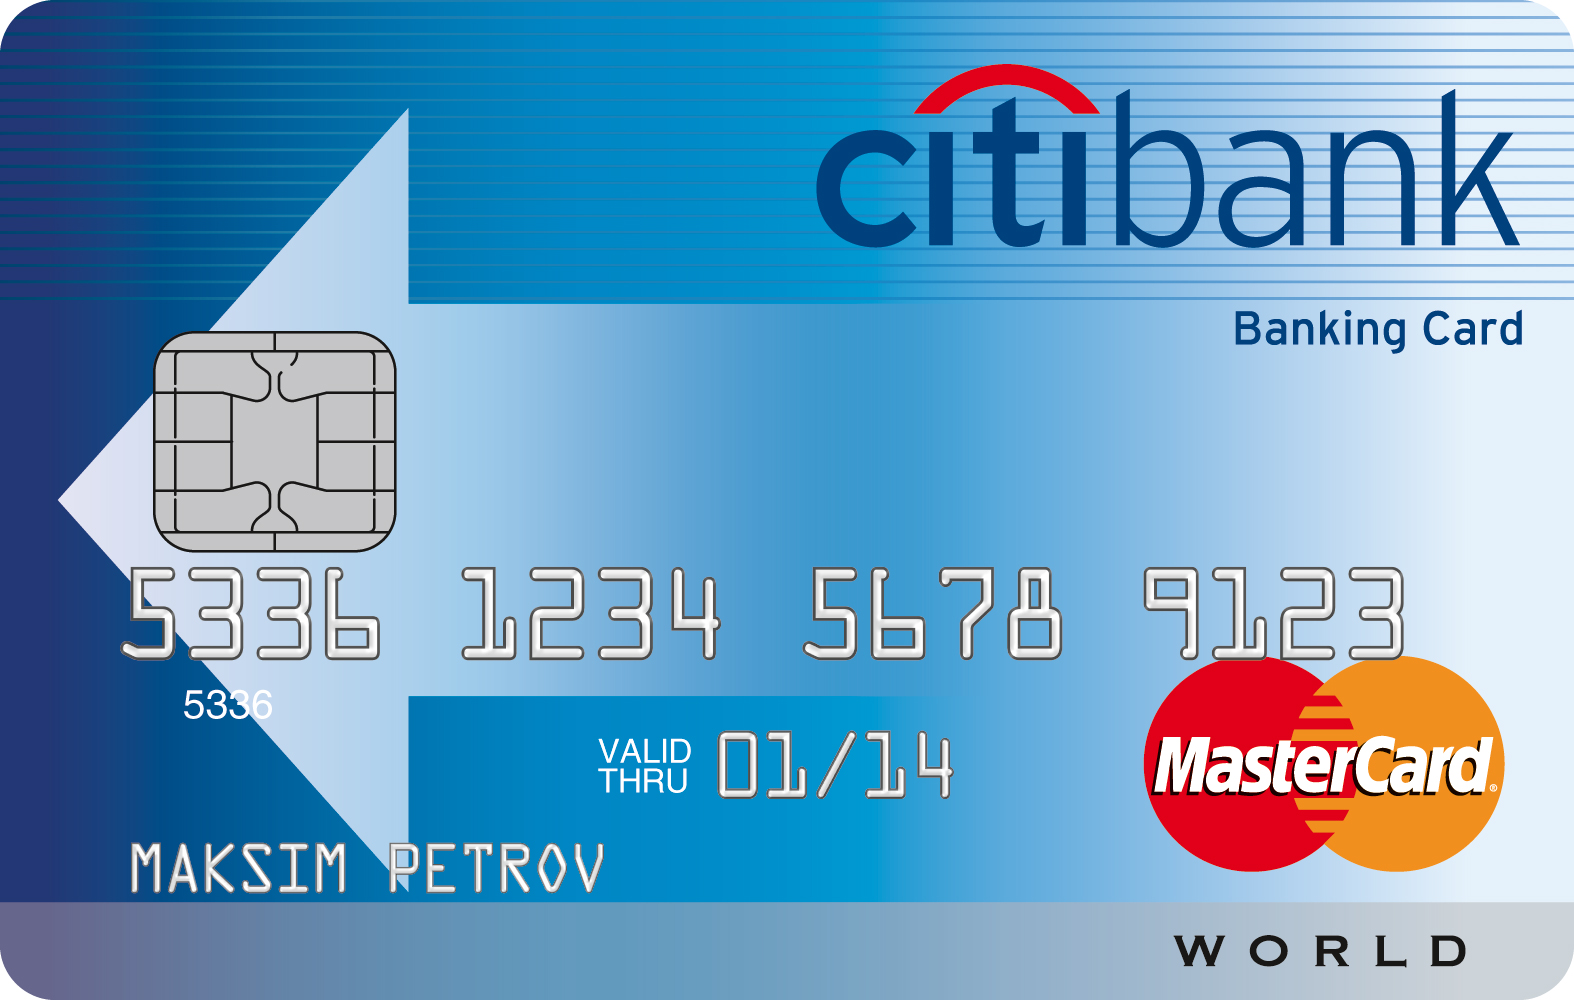 Как максимально быстро активировать карту Ситибанка?